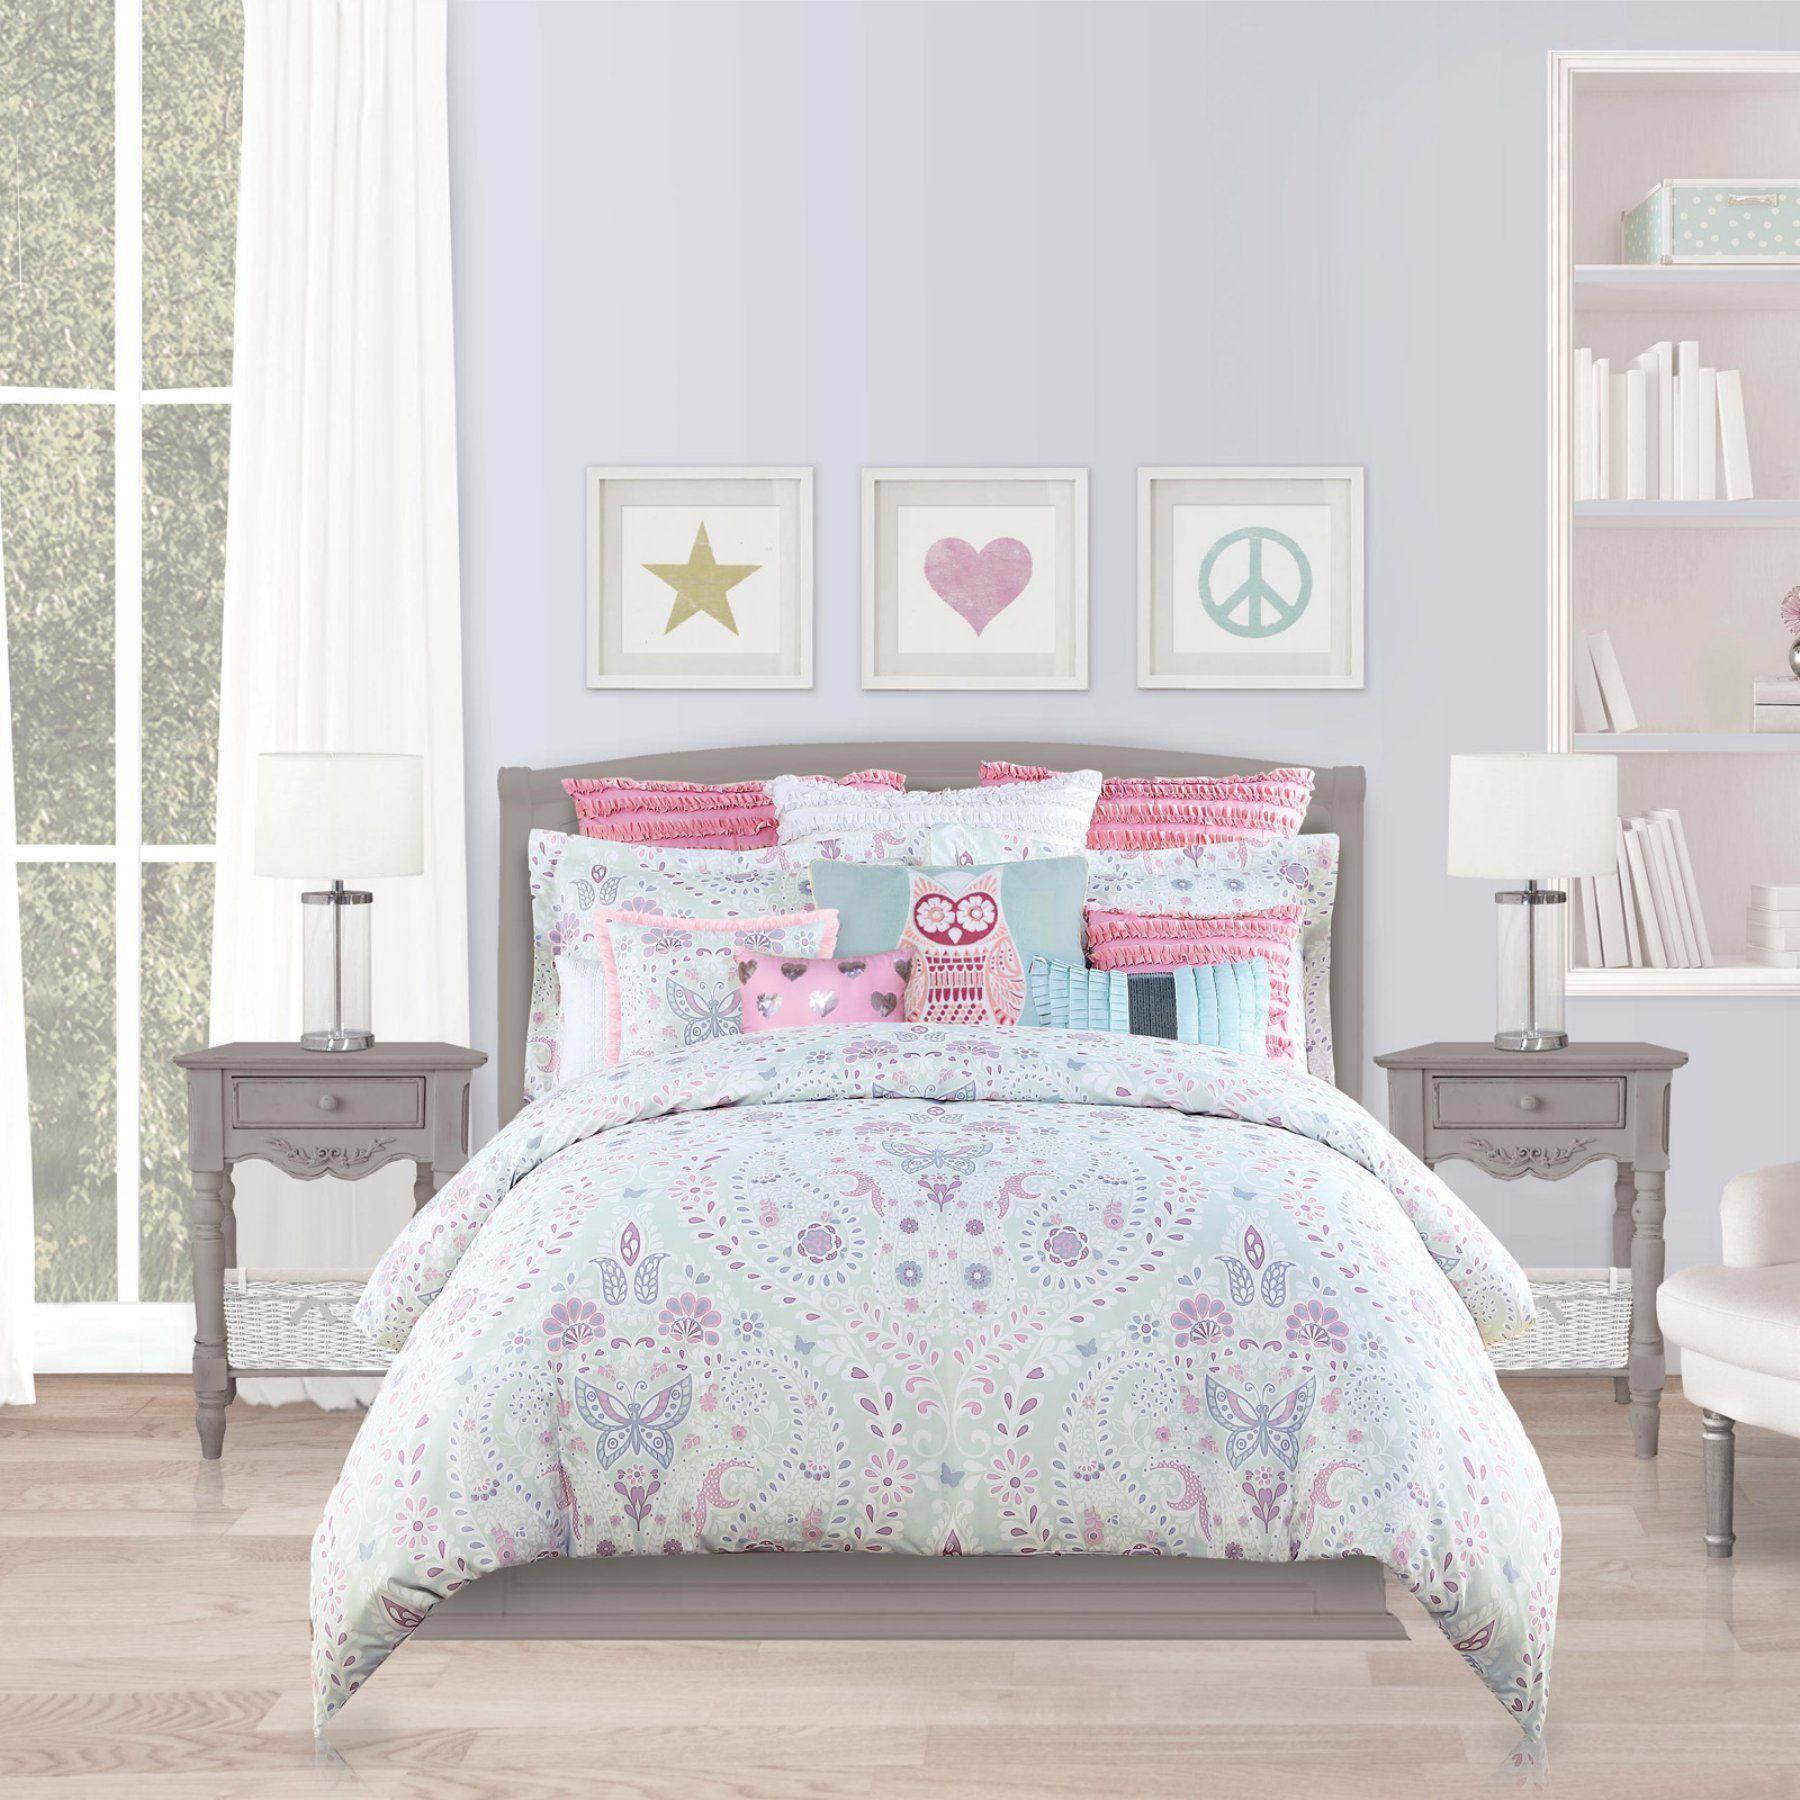 butterfly paisley comforter set by envogue international rh pinterest com